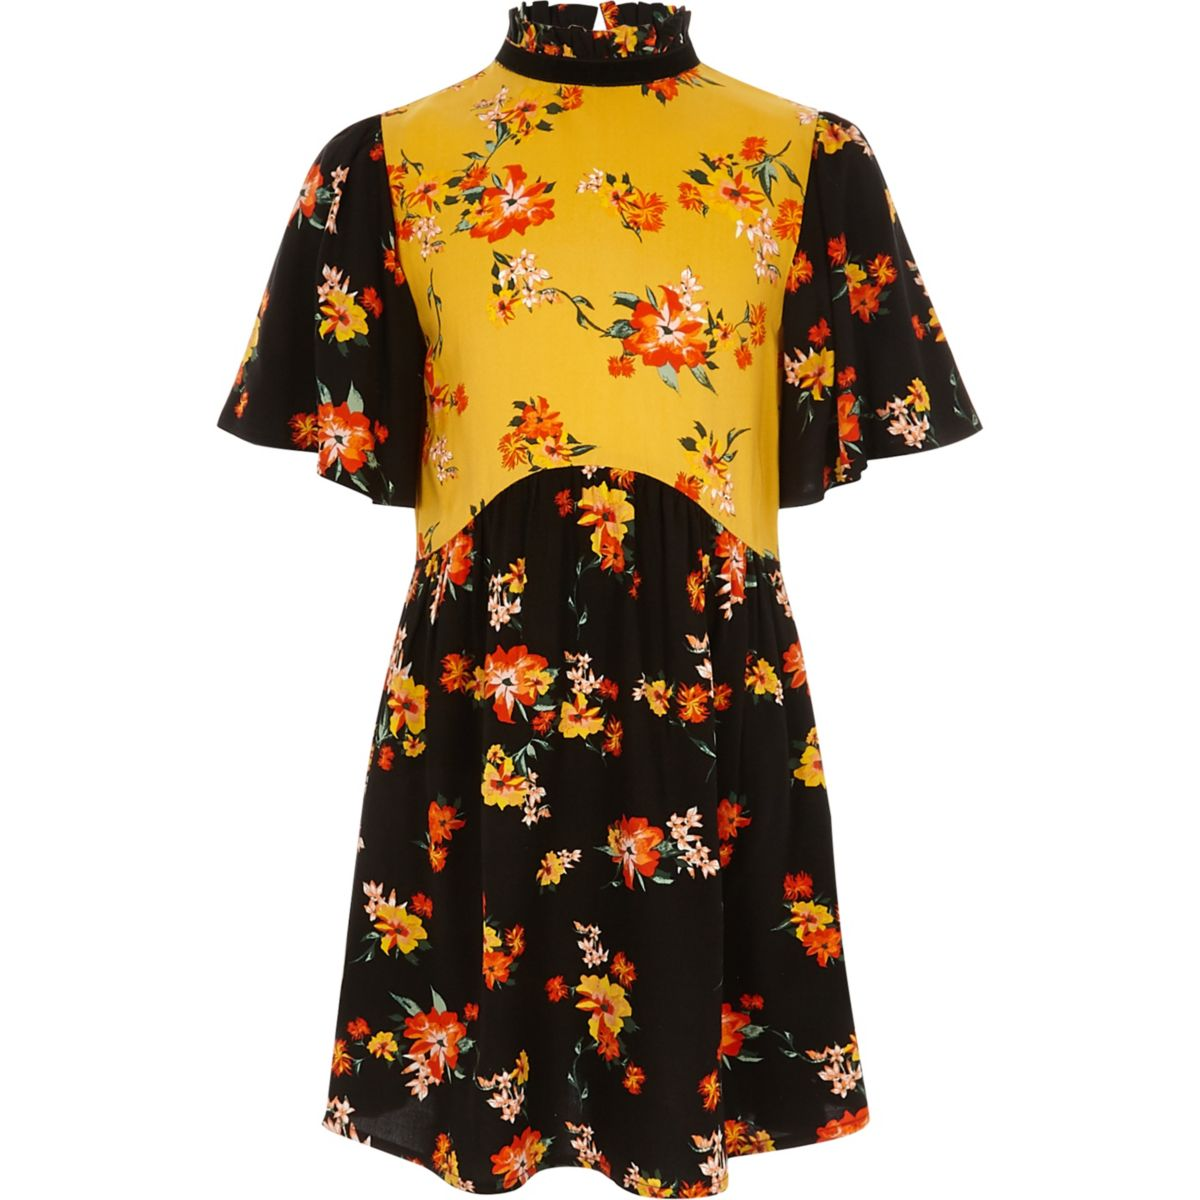 Girls black mixed floral print dress